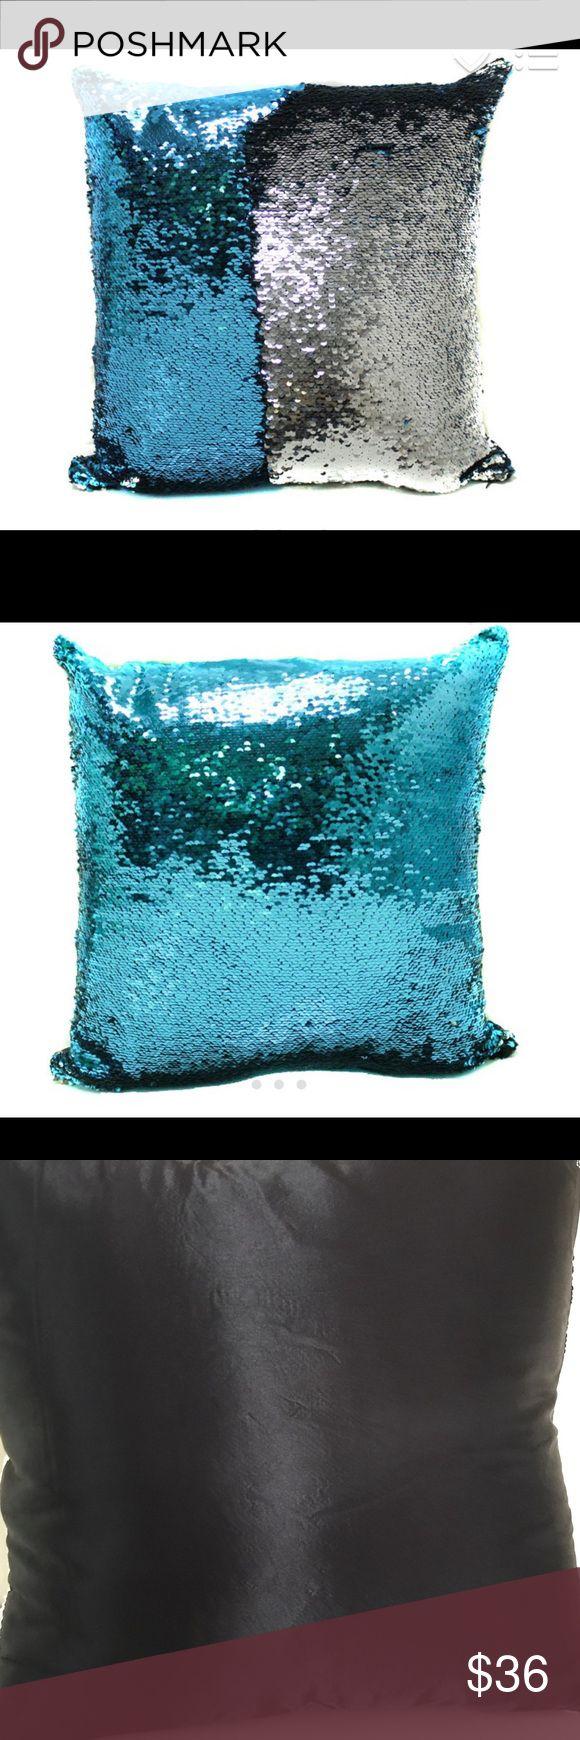 Greatest 21 best Mermaid pillows images on Pinterest | Mermaid pillow  QK21